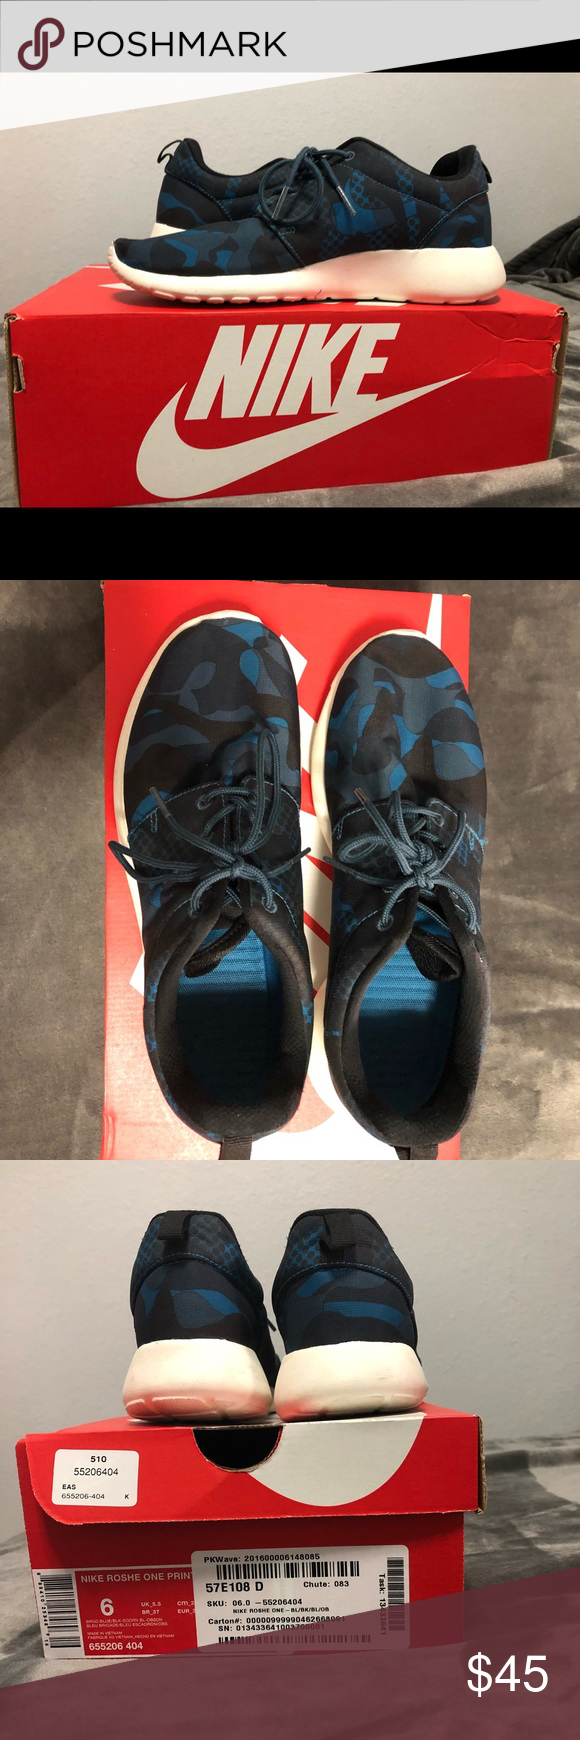 promo code 8e1f9 1cc13 Nike Roshe One W Black  Blue Print Original Price 80 Price is negotiable